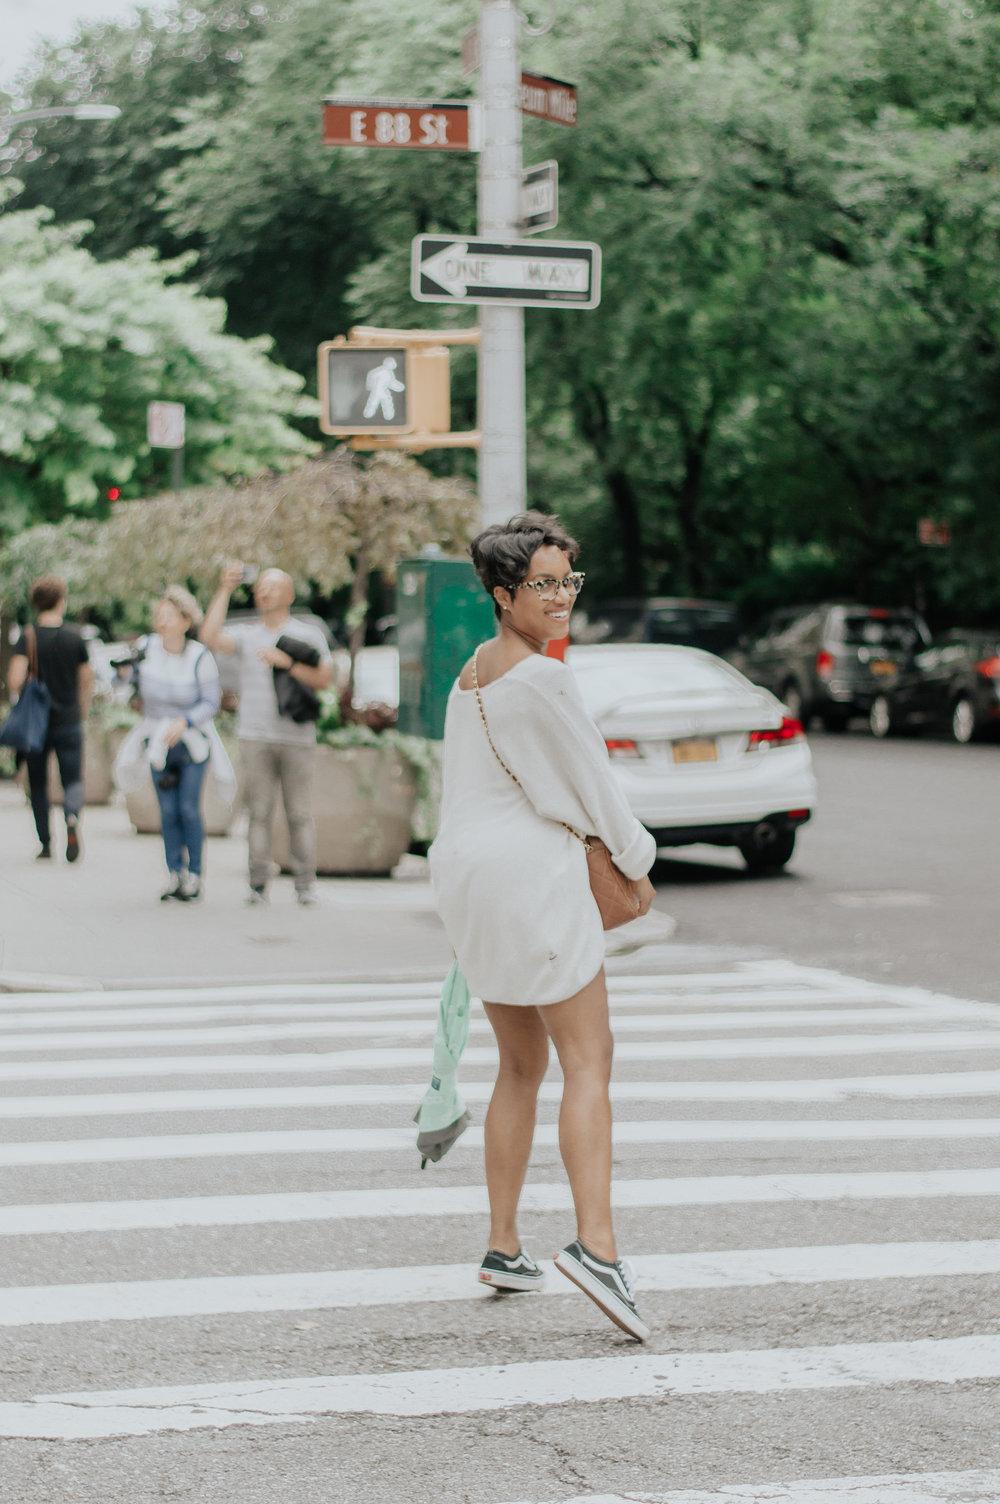 Street Tripping